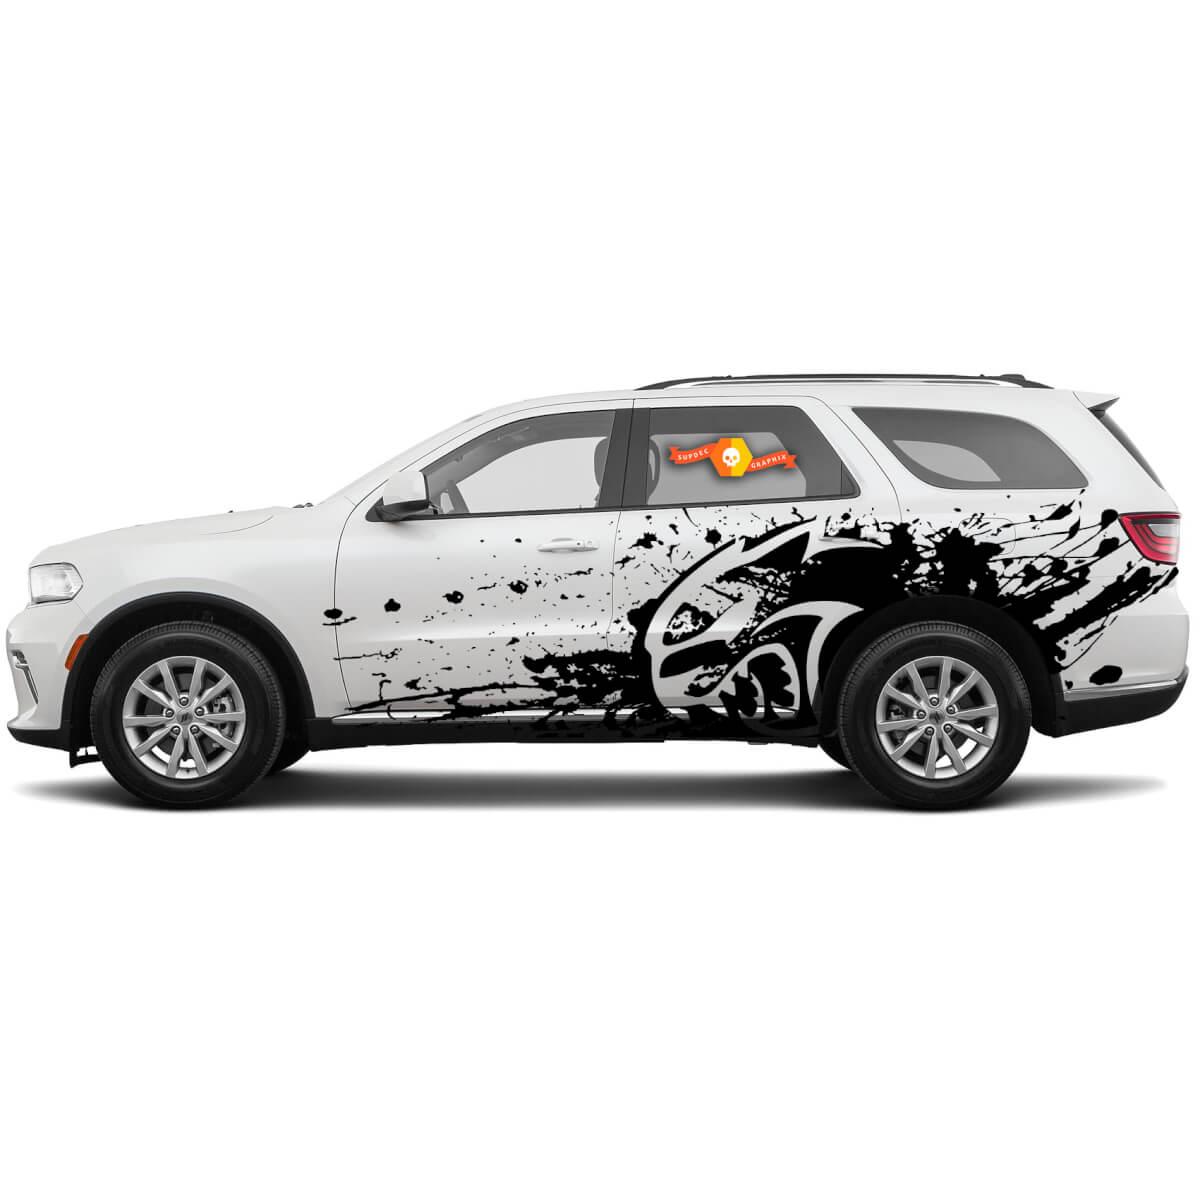 Neue Dodge SRT Durango Hellcat Sternstil Splash Grunge Stripes Kit Vinyl Aufkleber Grafik